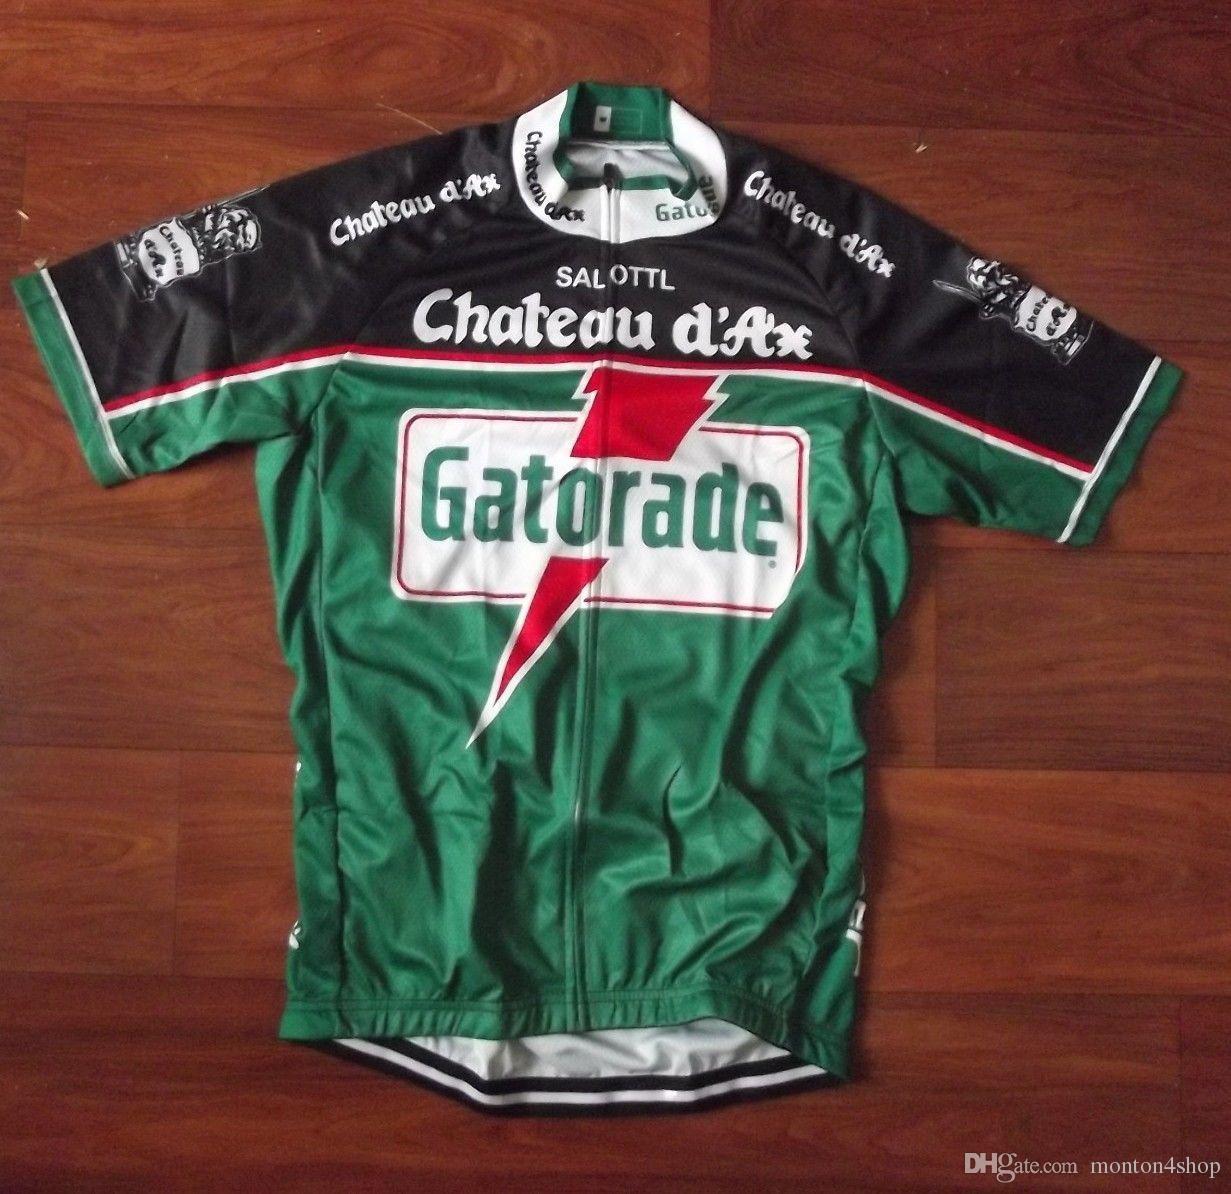 Chateau dax gatorade فريق رجل روبا ciclismo الدراجات الملابس / mtb الدراجة الملابس / دراجة الملابس / 2019 الدراجات موحدة الدراجات الفانيلة A59